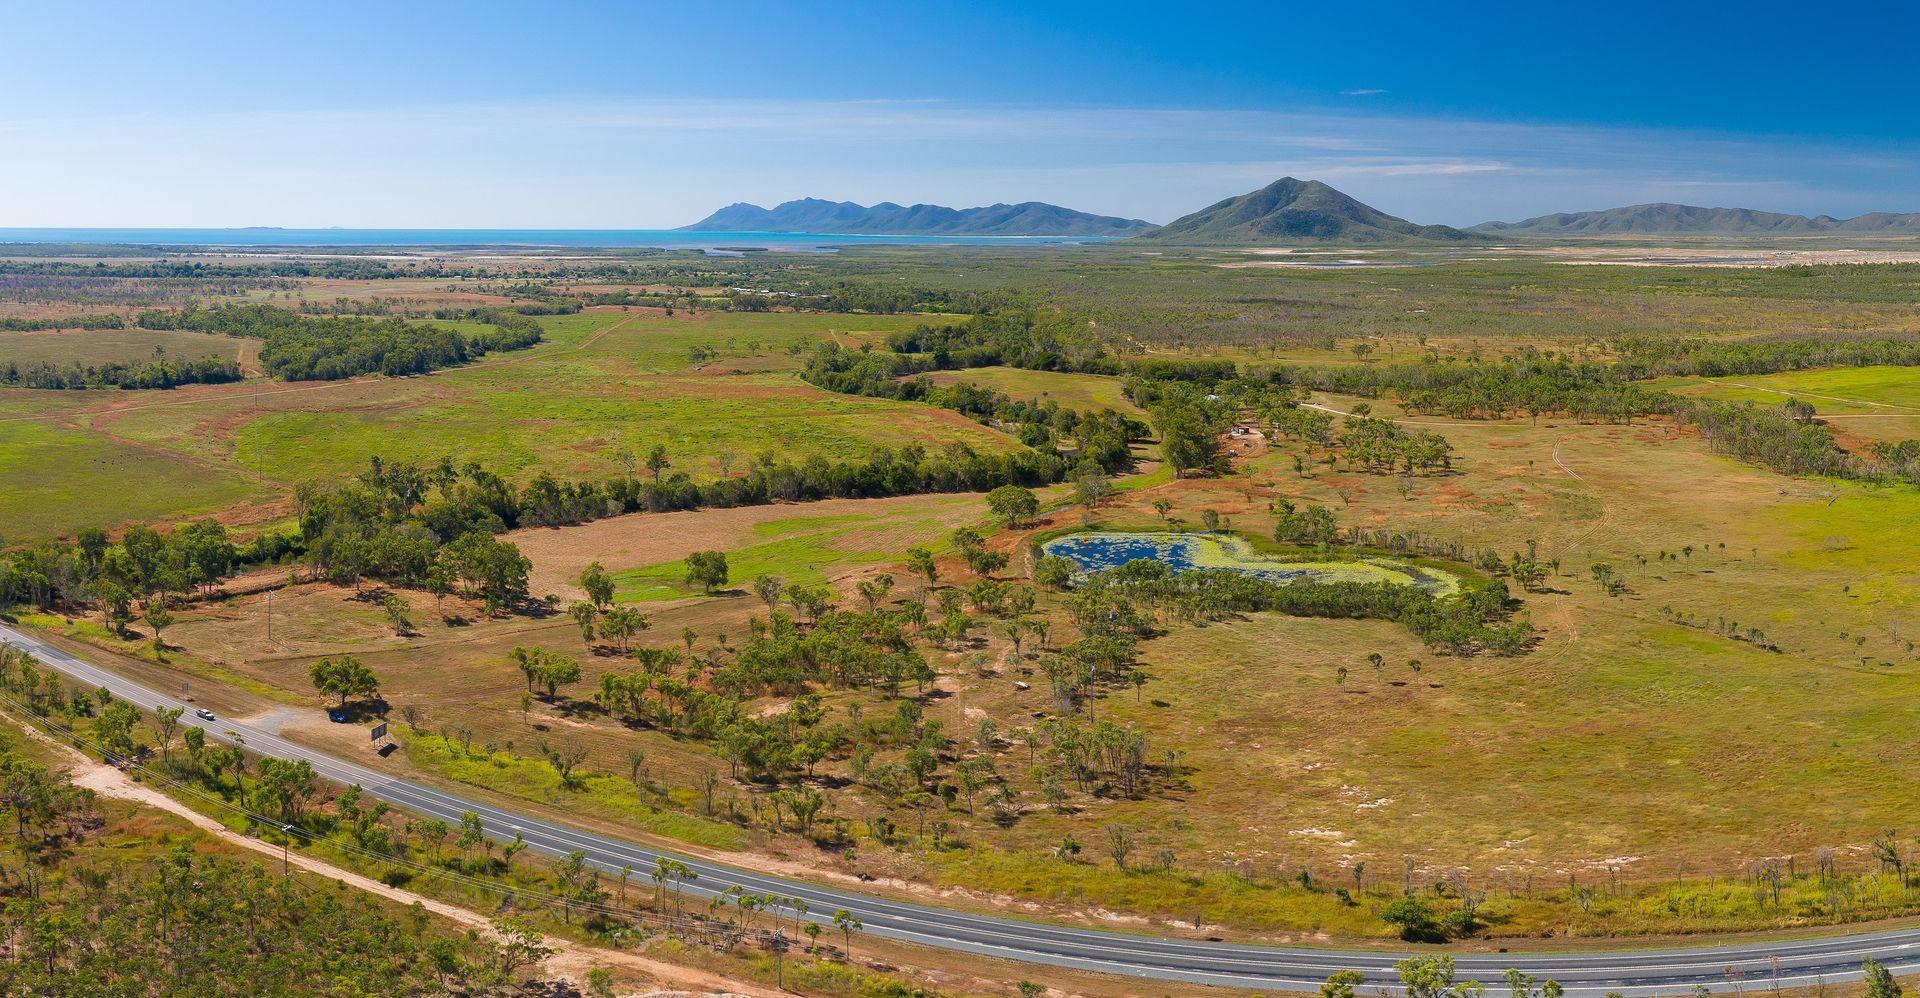 Lot 7 Longford Creek, Bruce Highway, Bowen QLD 4805, Image 1